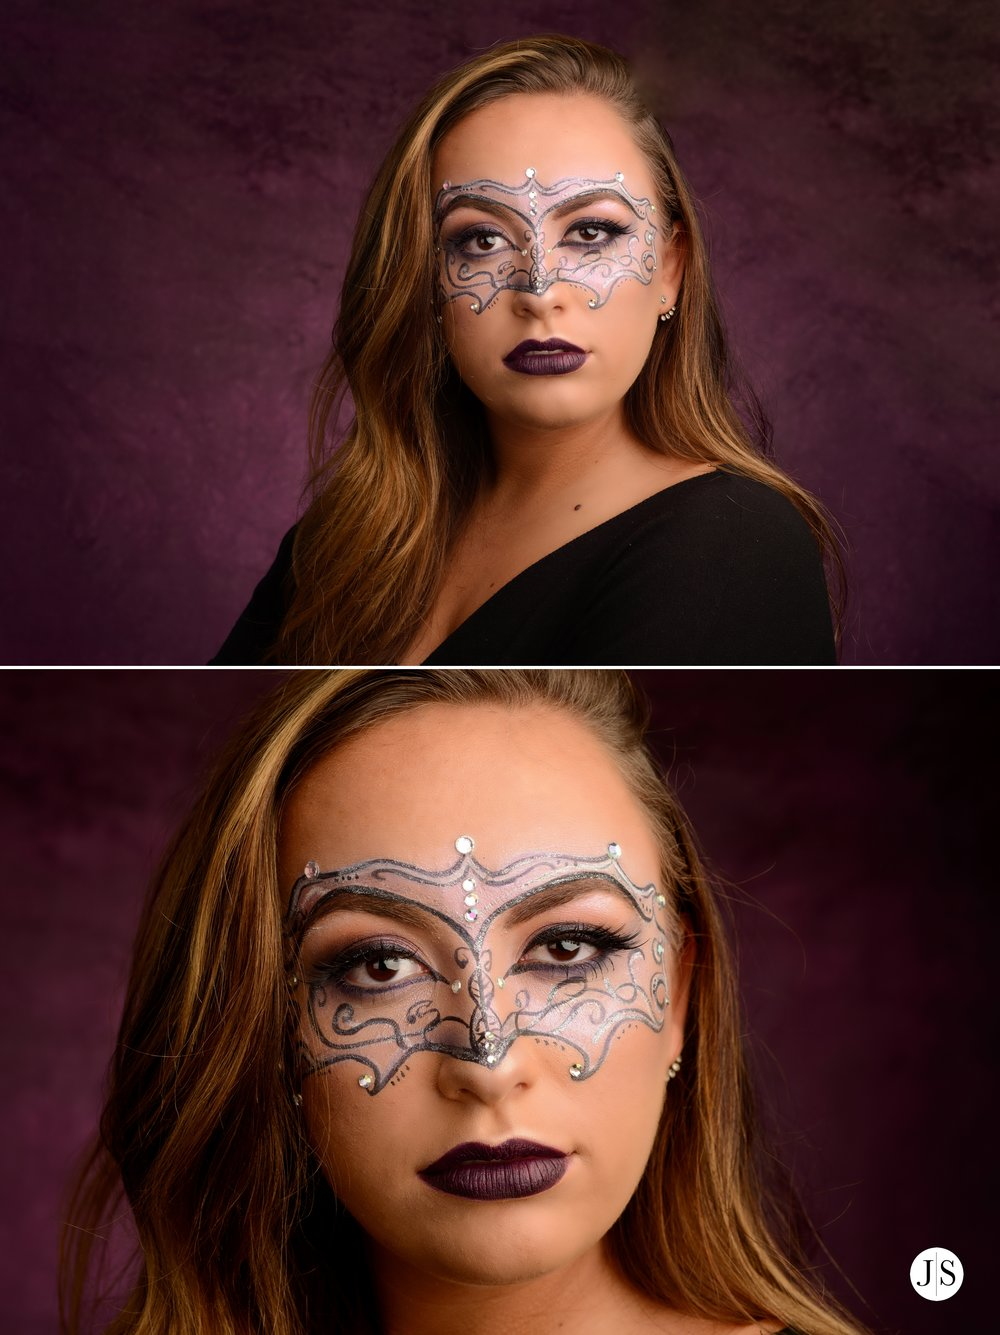 senior-portrait-studio-maryland-portraits-karawaggoner-glamoween-makeup-photo  3.jpg